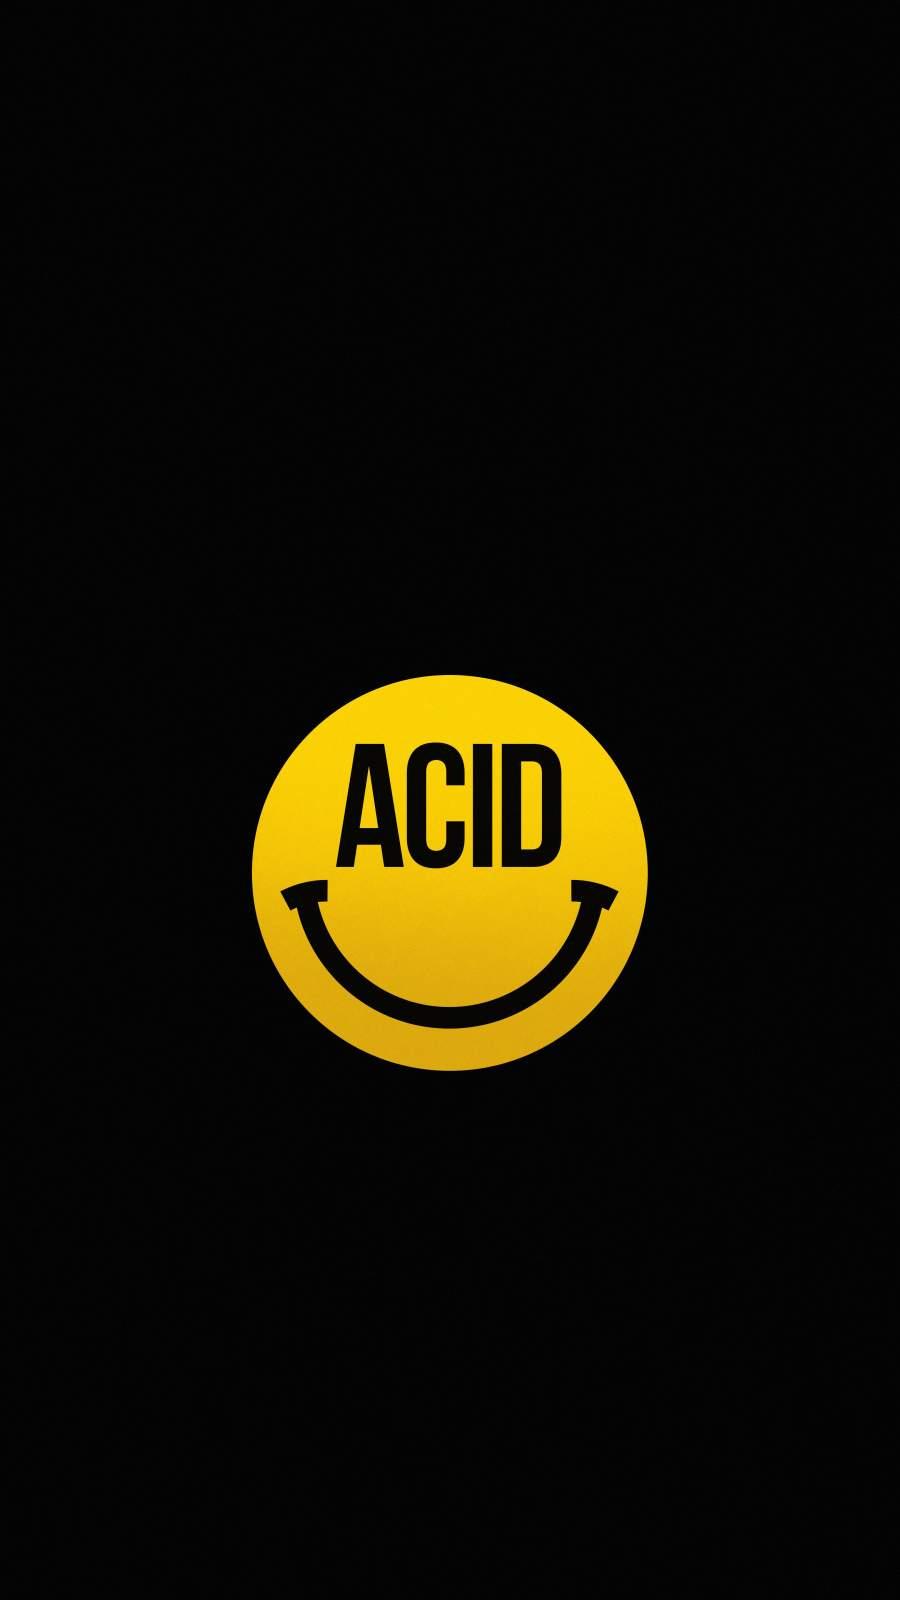 Acid Smile iPhone Wallpaper